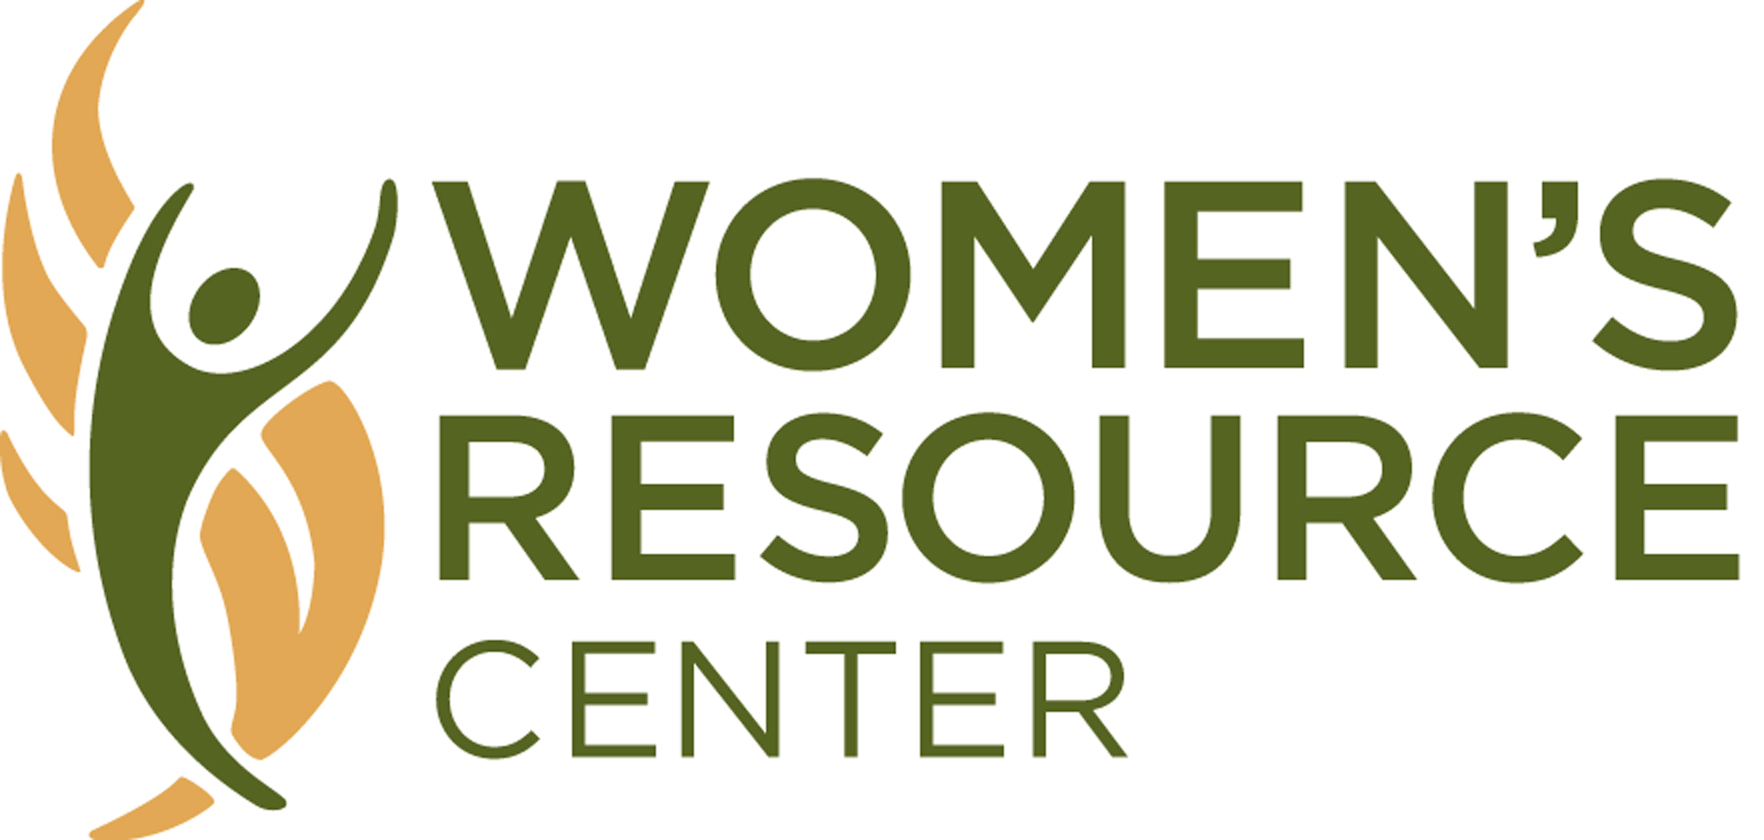 Women's Resource Center Logo.